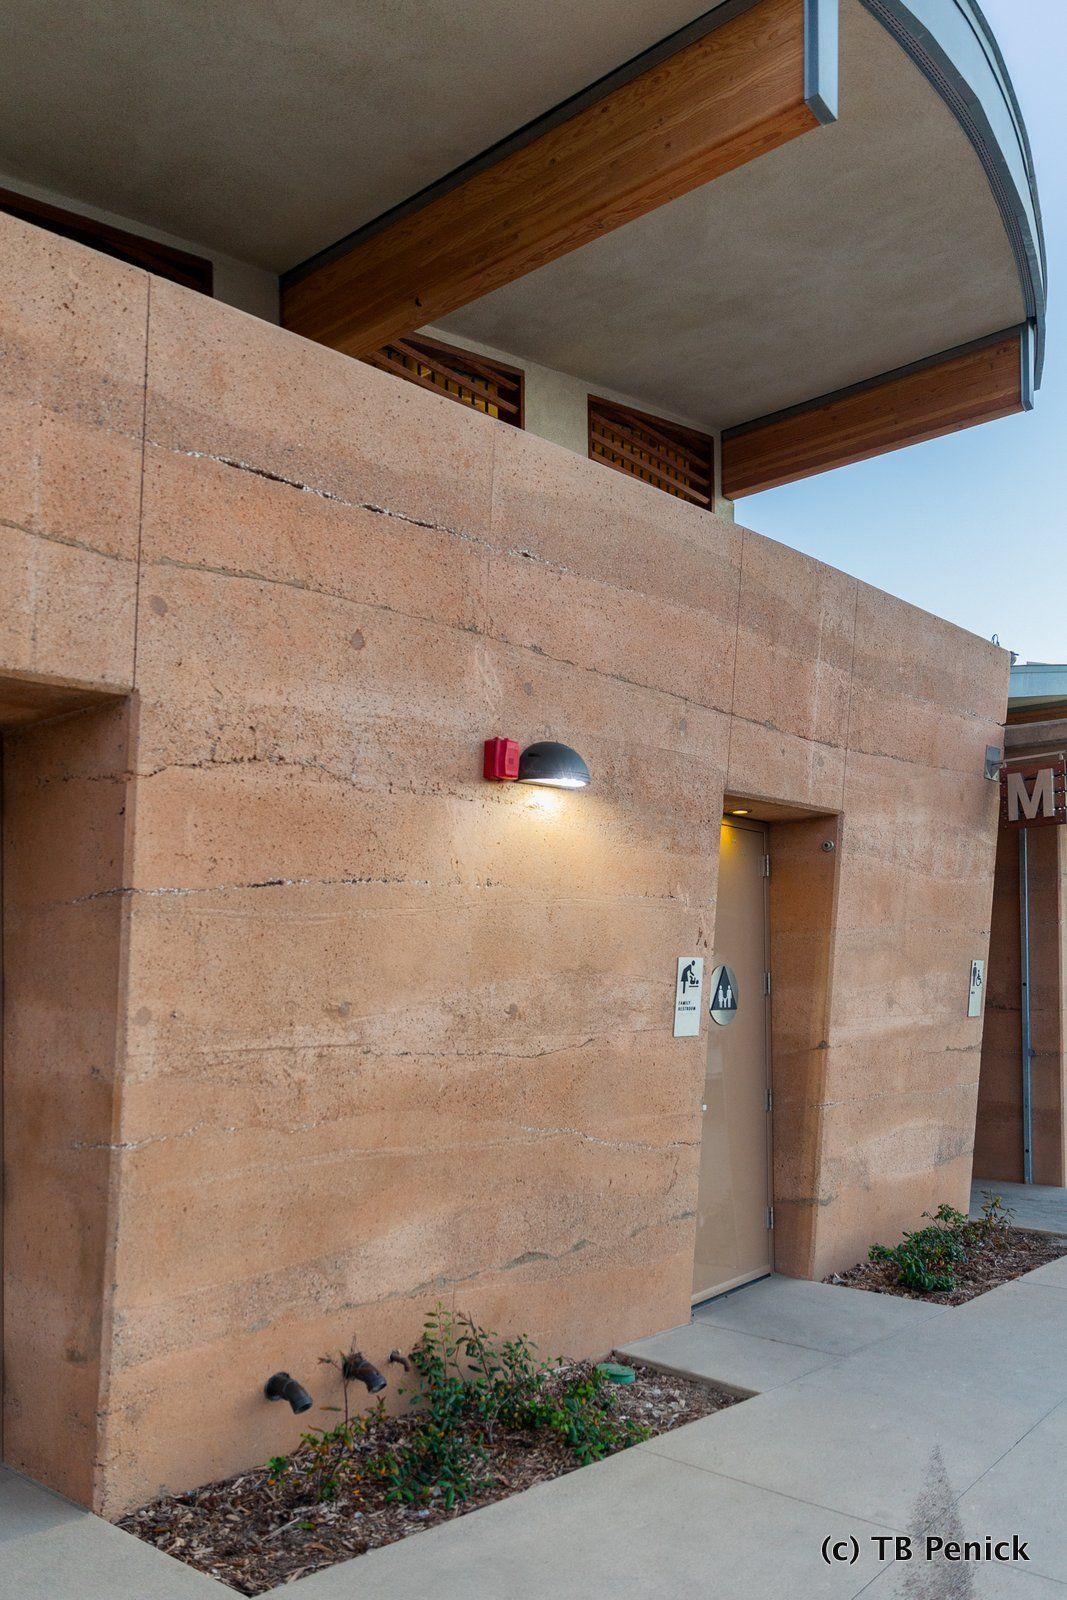 Decorative Concrete Sedimentary Walls Installed By Dcc Member Tb Penick At Moonlight Beach In California Concrete Decor Exterior Decorative Pervious Concrete